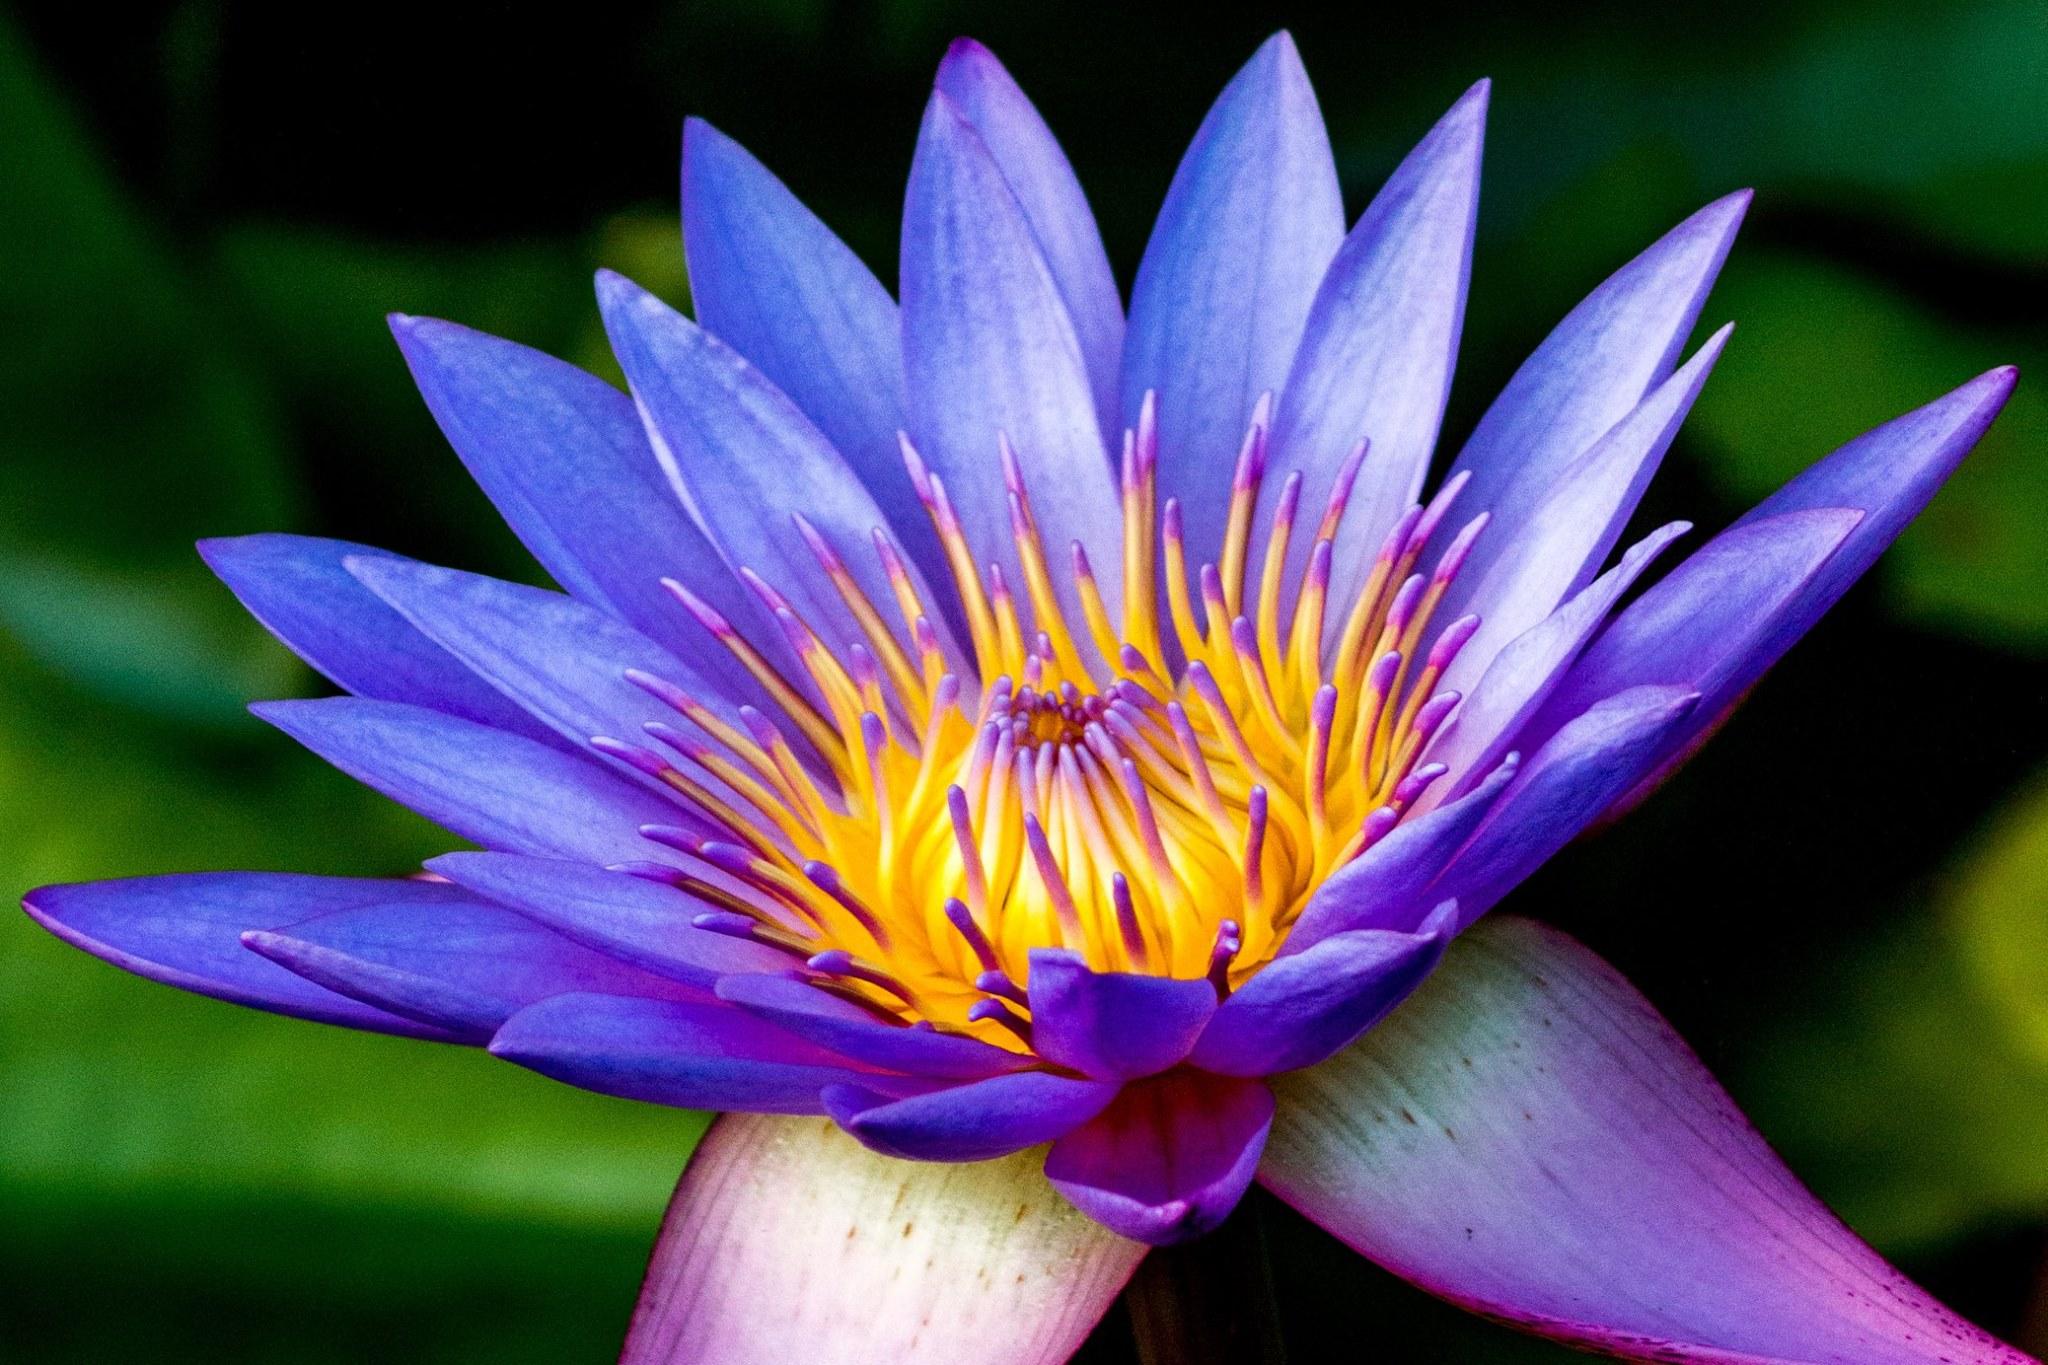 invite-to-paradise-sri-lanka-and-maldives-specialists-travel-agent-tour-operator-customer-review--feedback-joel-rhian-temple-flower.jpg